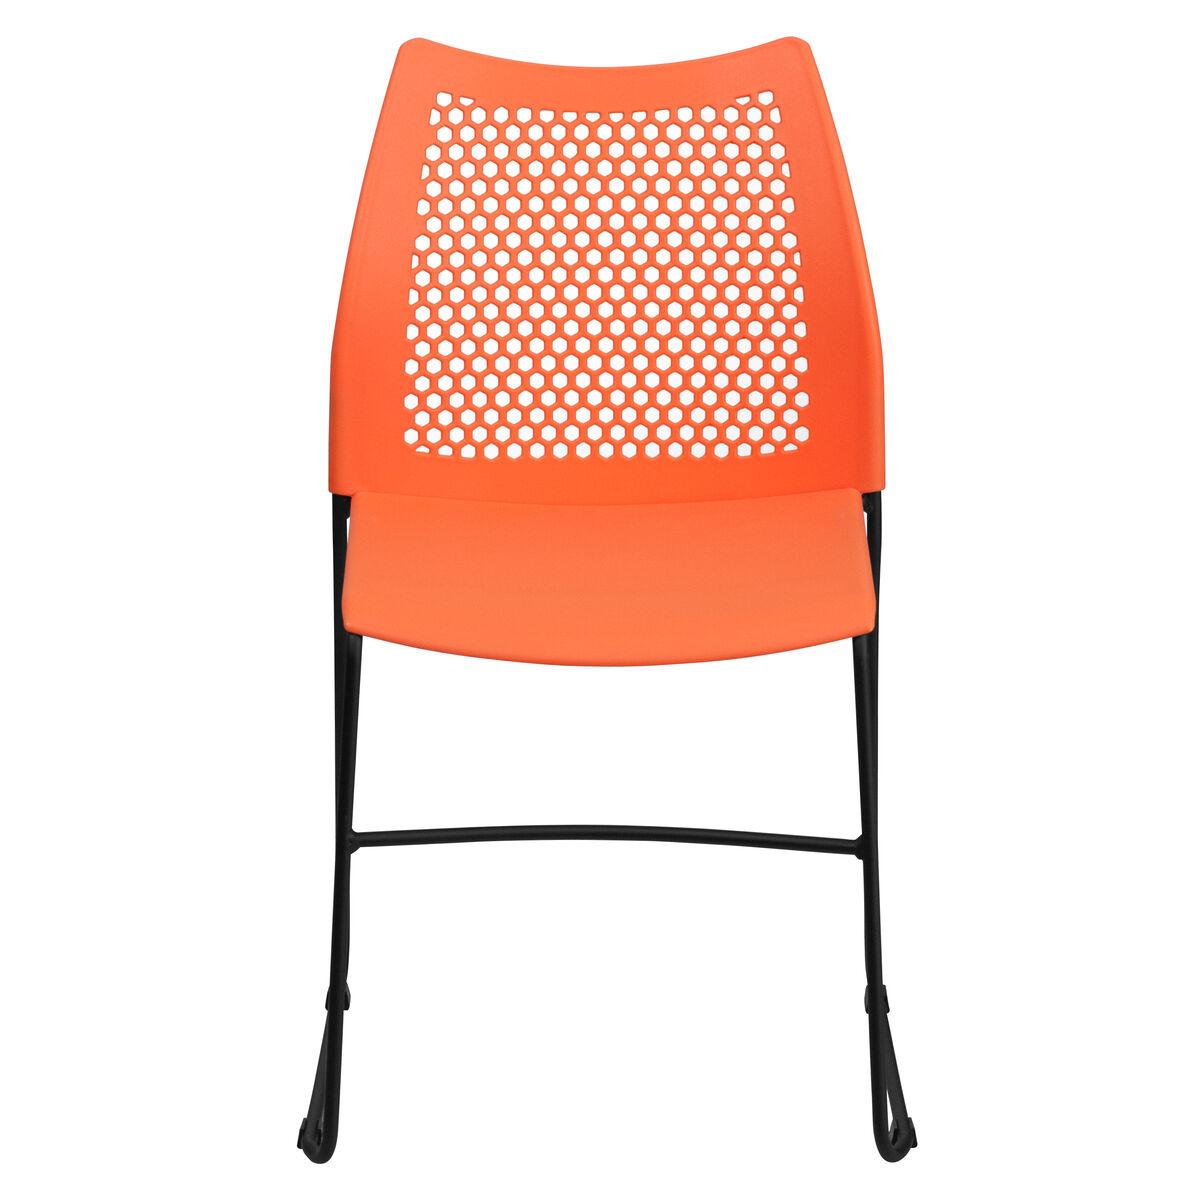 Orange Plastic Stack Chair Rut 498a Orange Gg